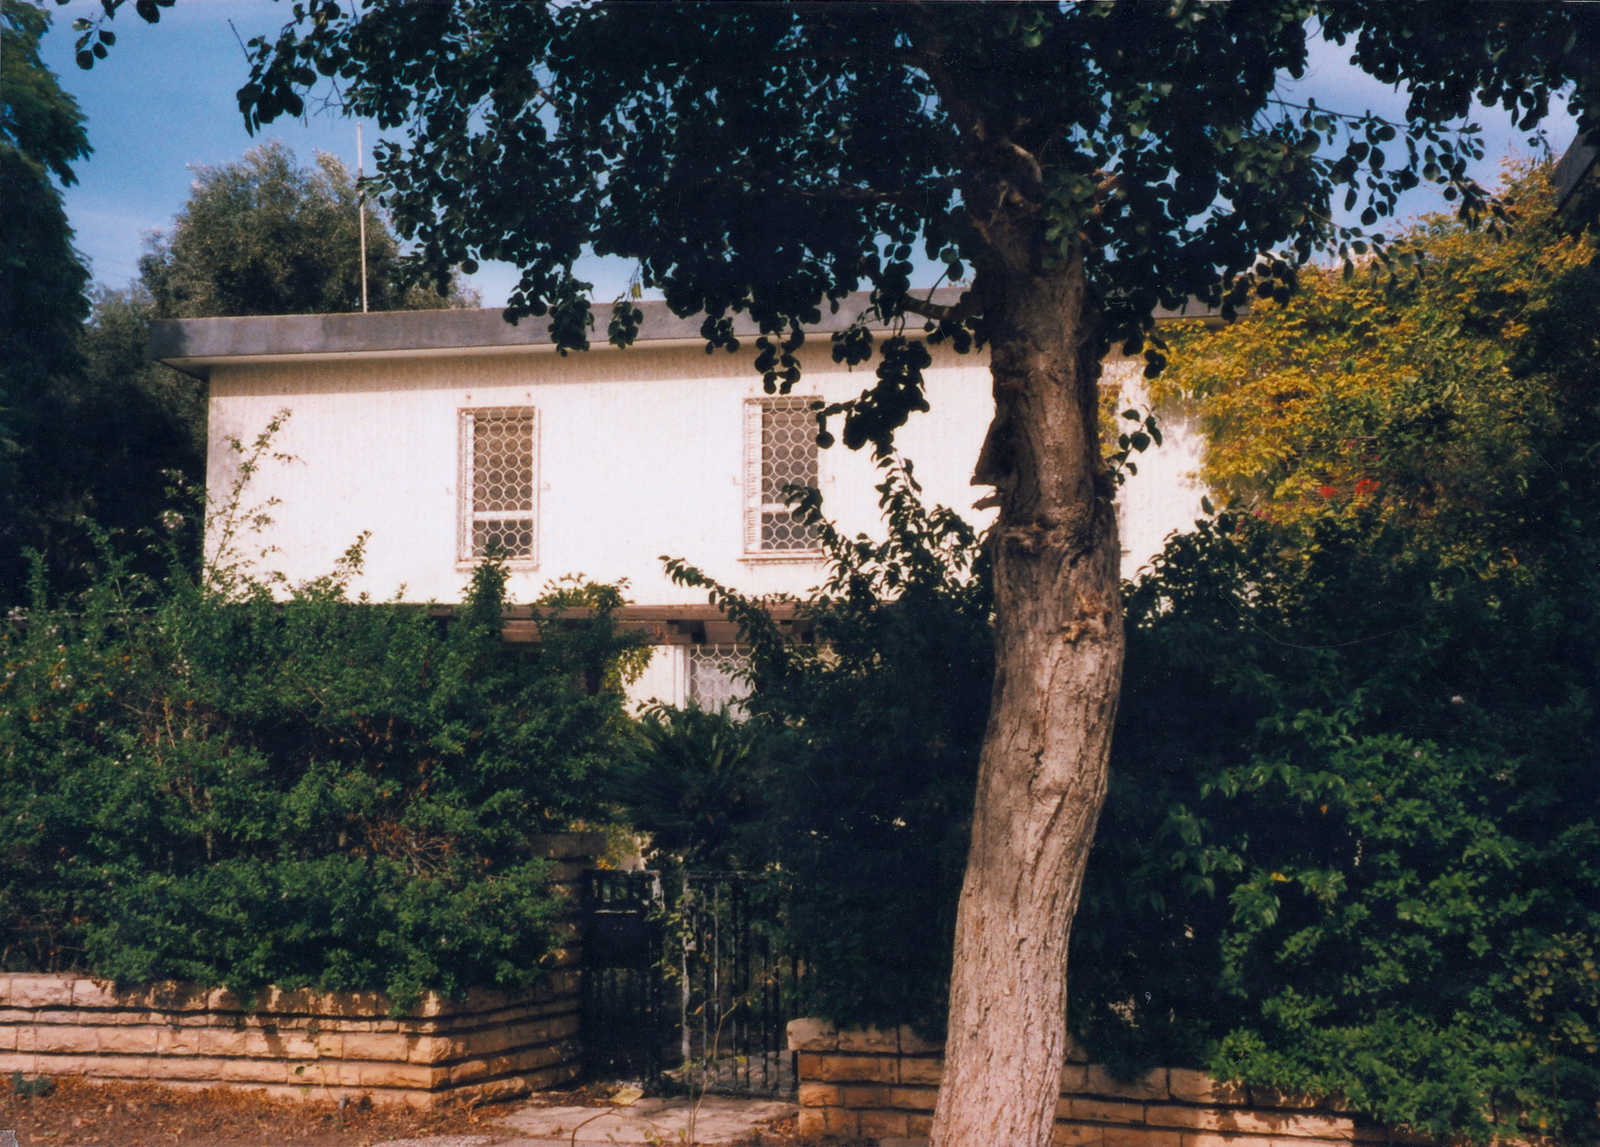 Tel Aviv - Deputy Chief of Mission Residence - 1996